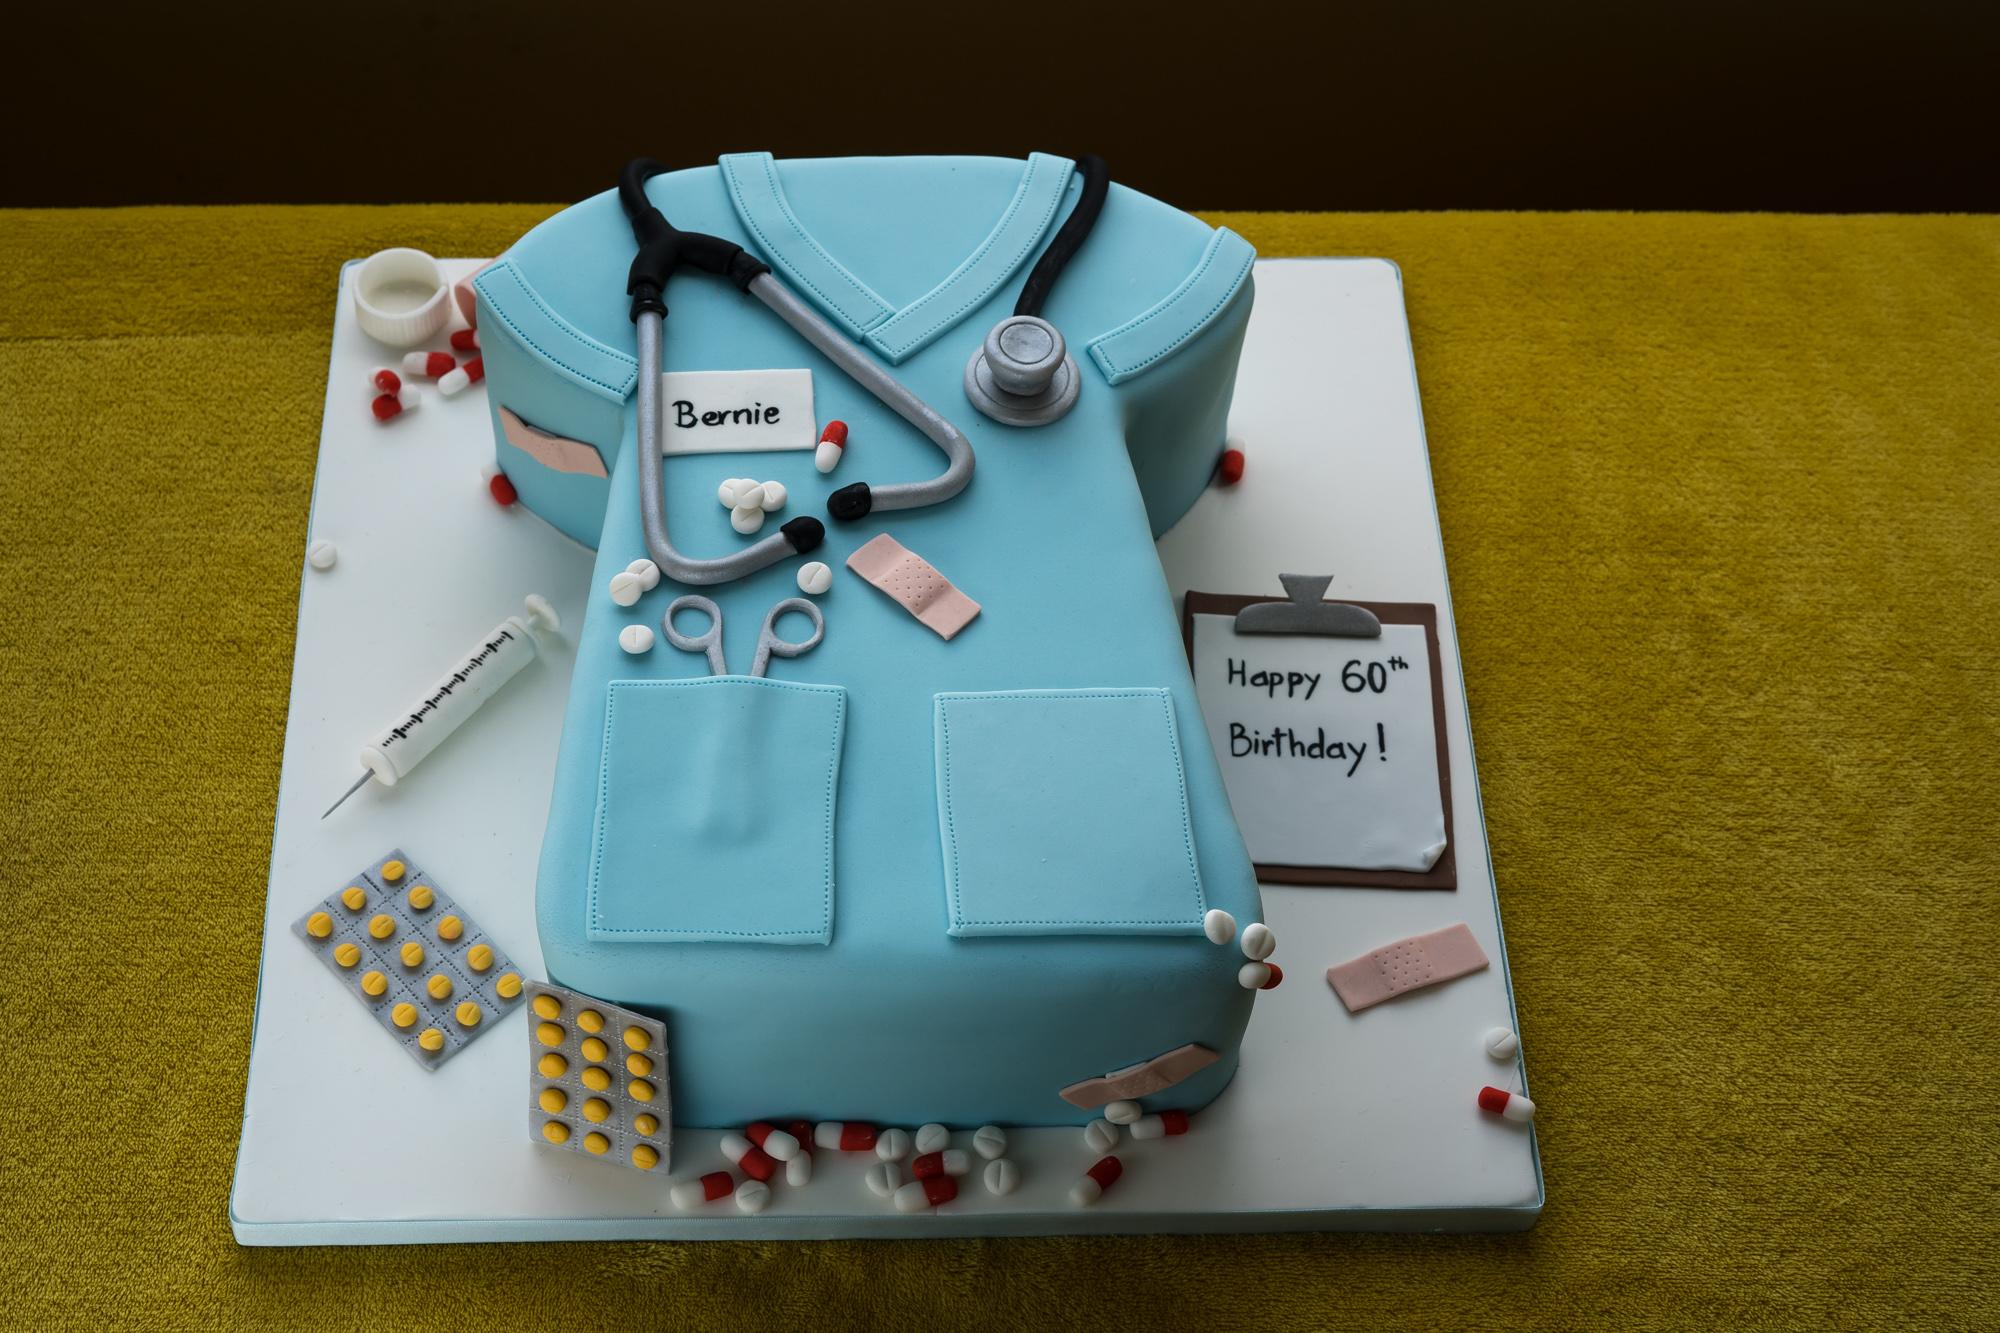 Cake in style of nurses uniform